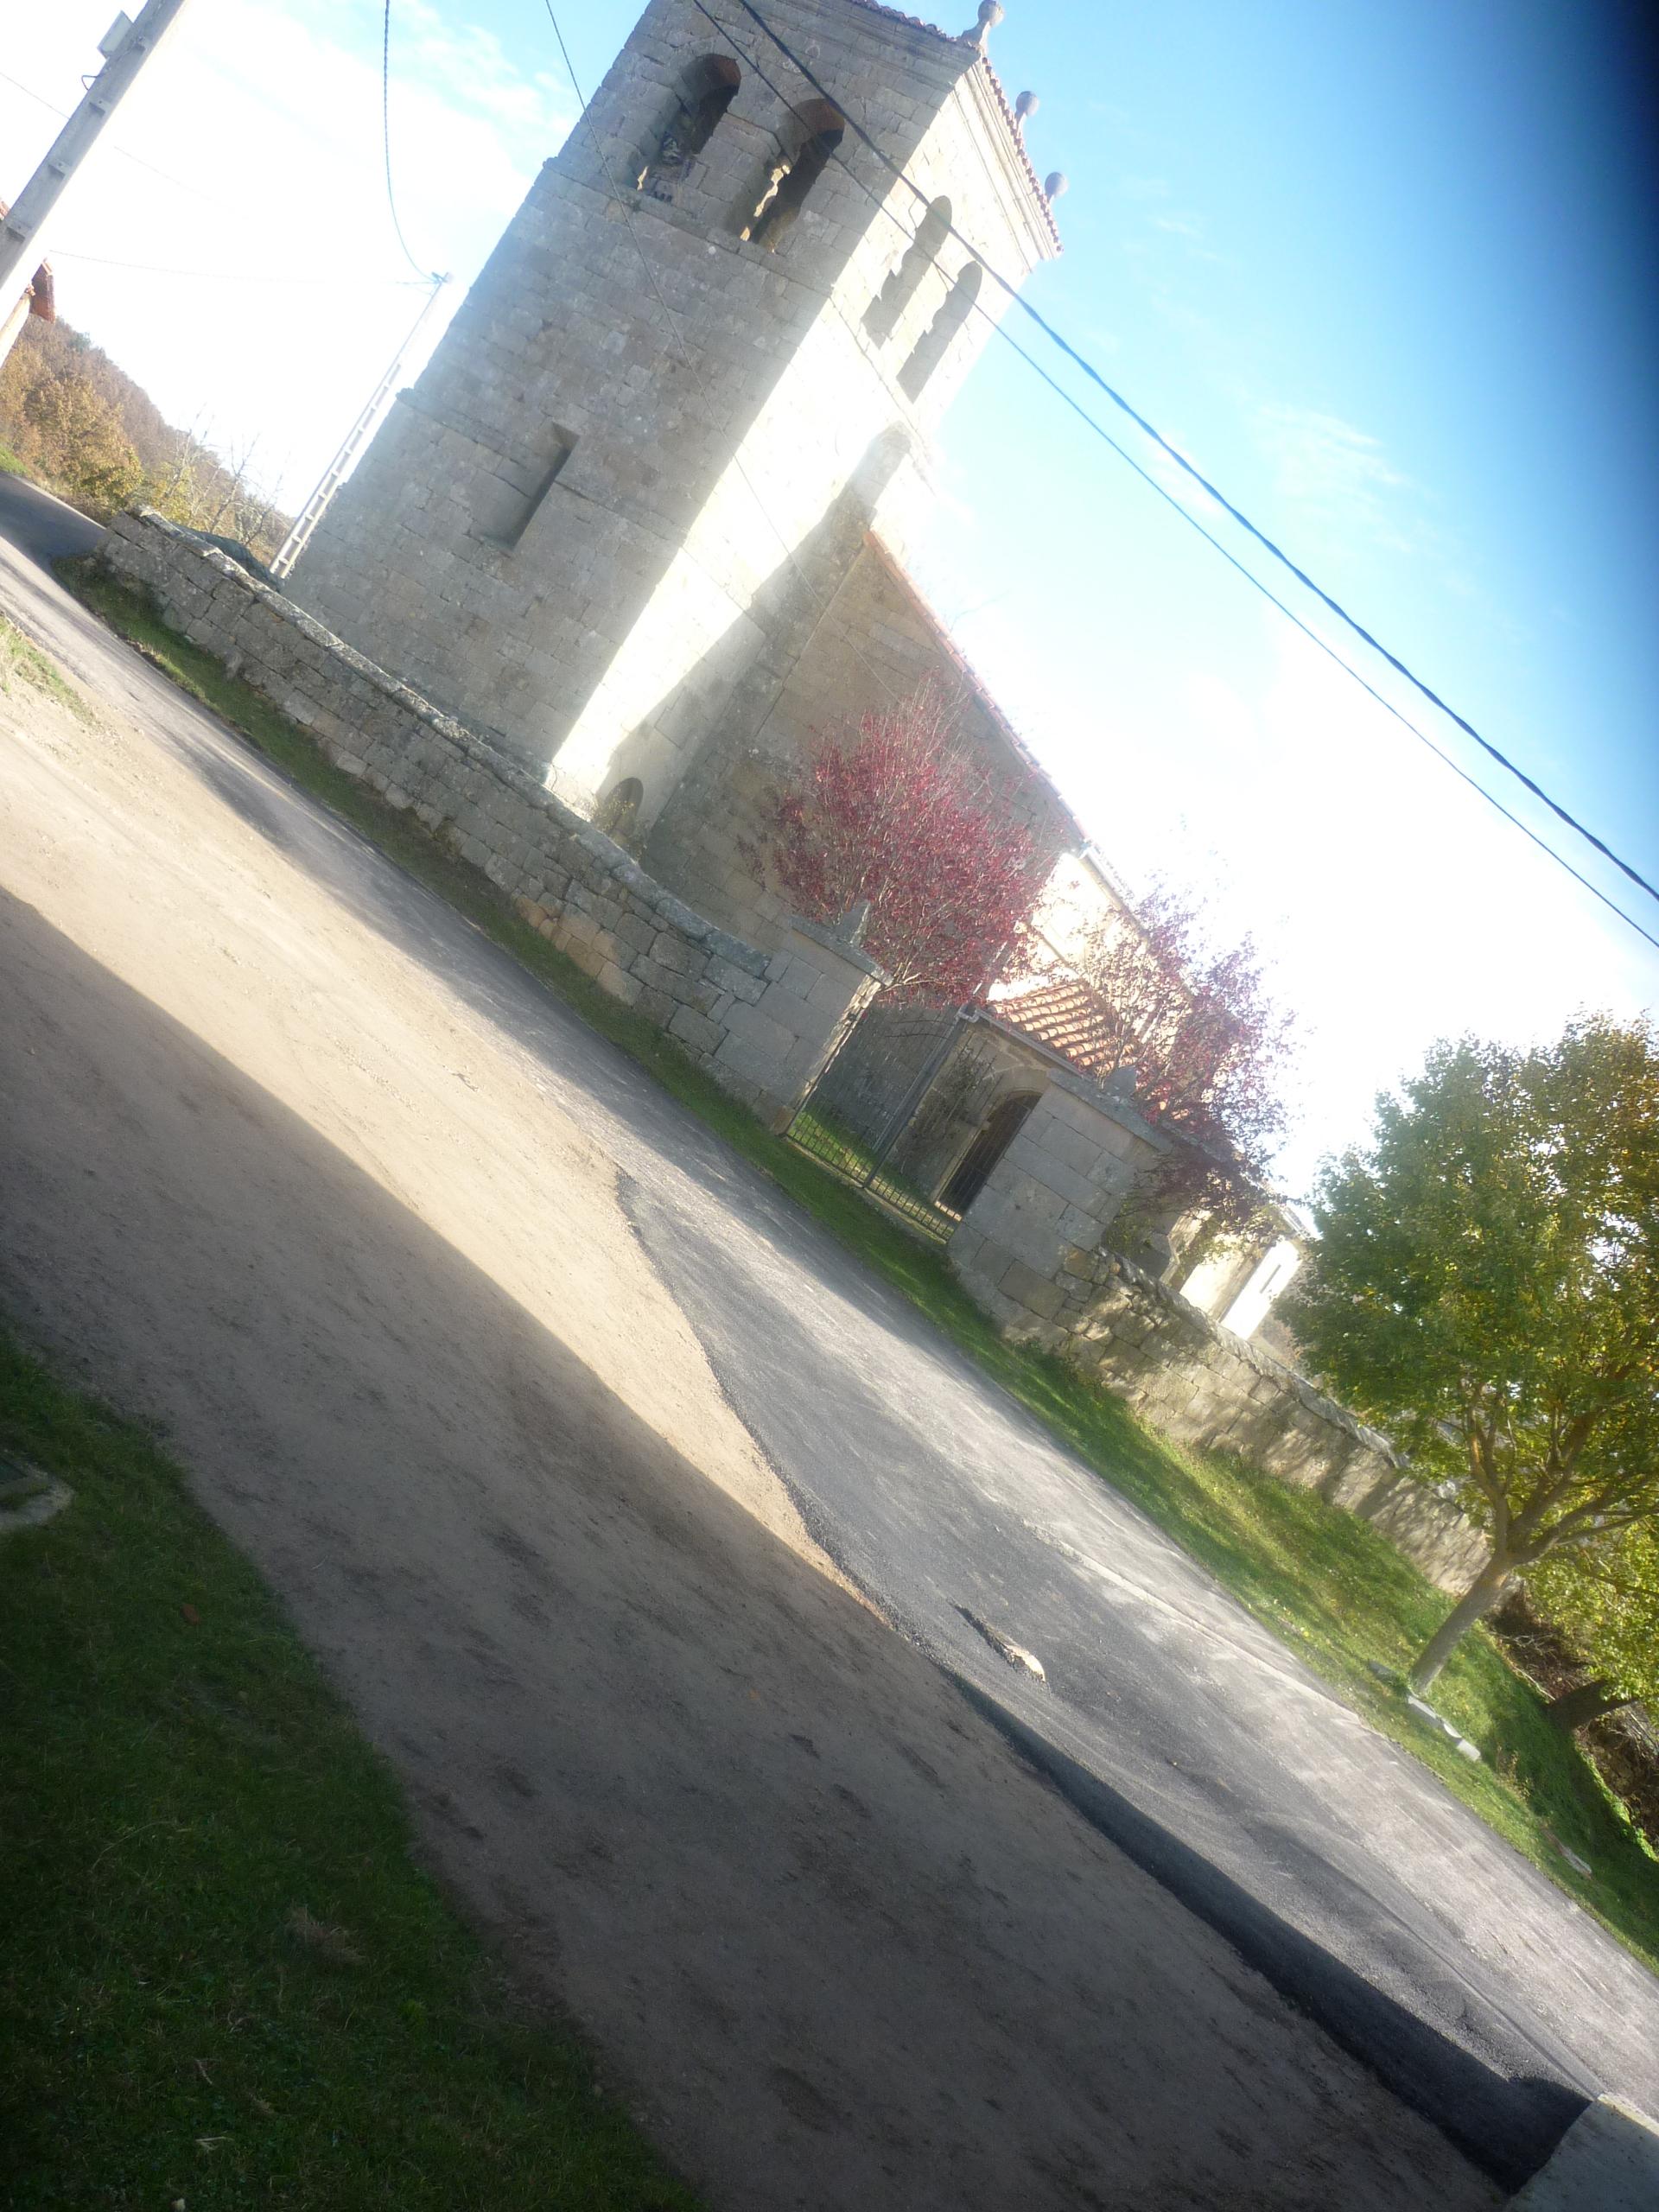 https://www.navamuel.es/images/CasasyCalles/Iglesia.jpg